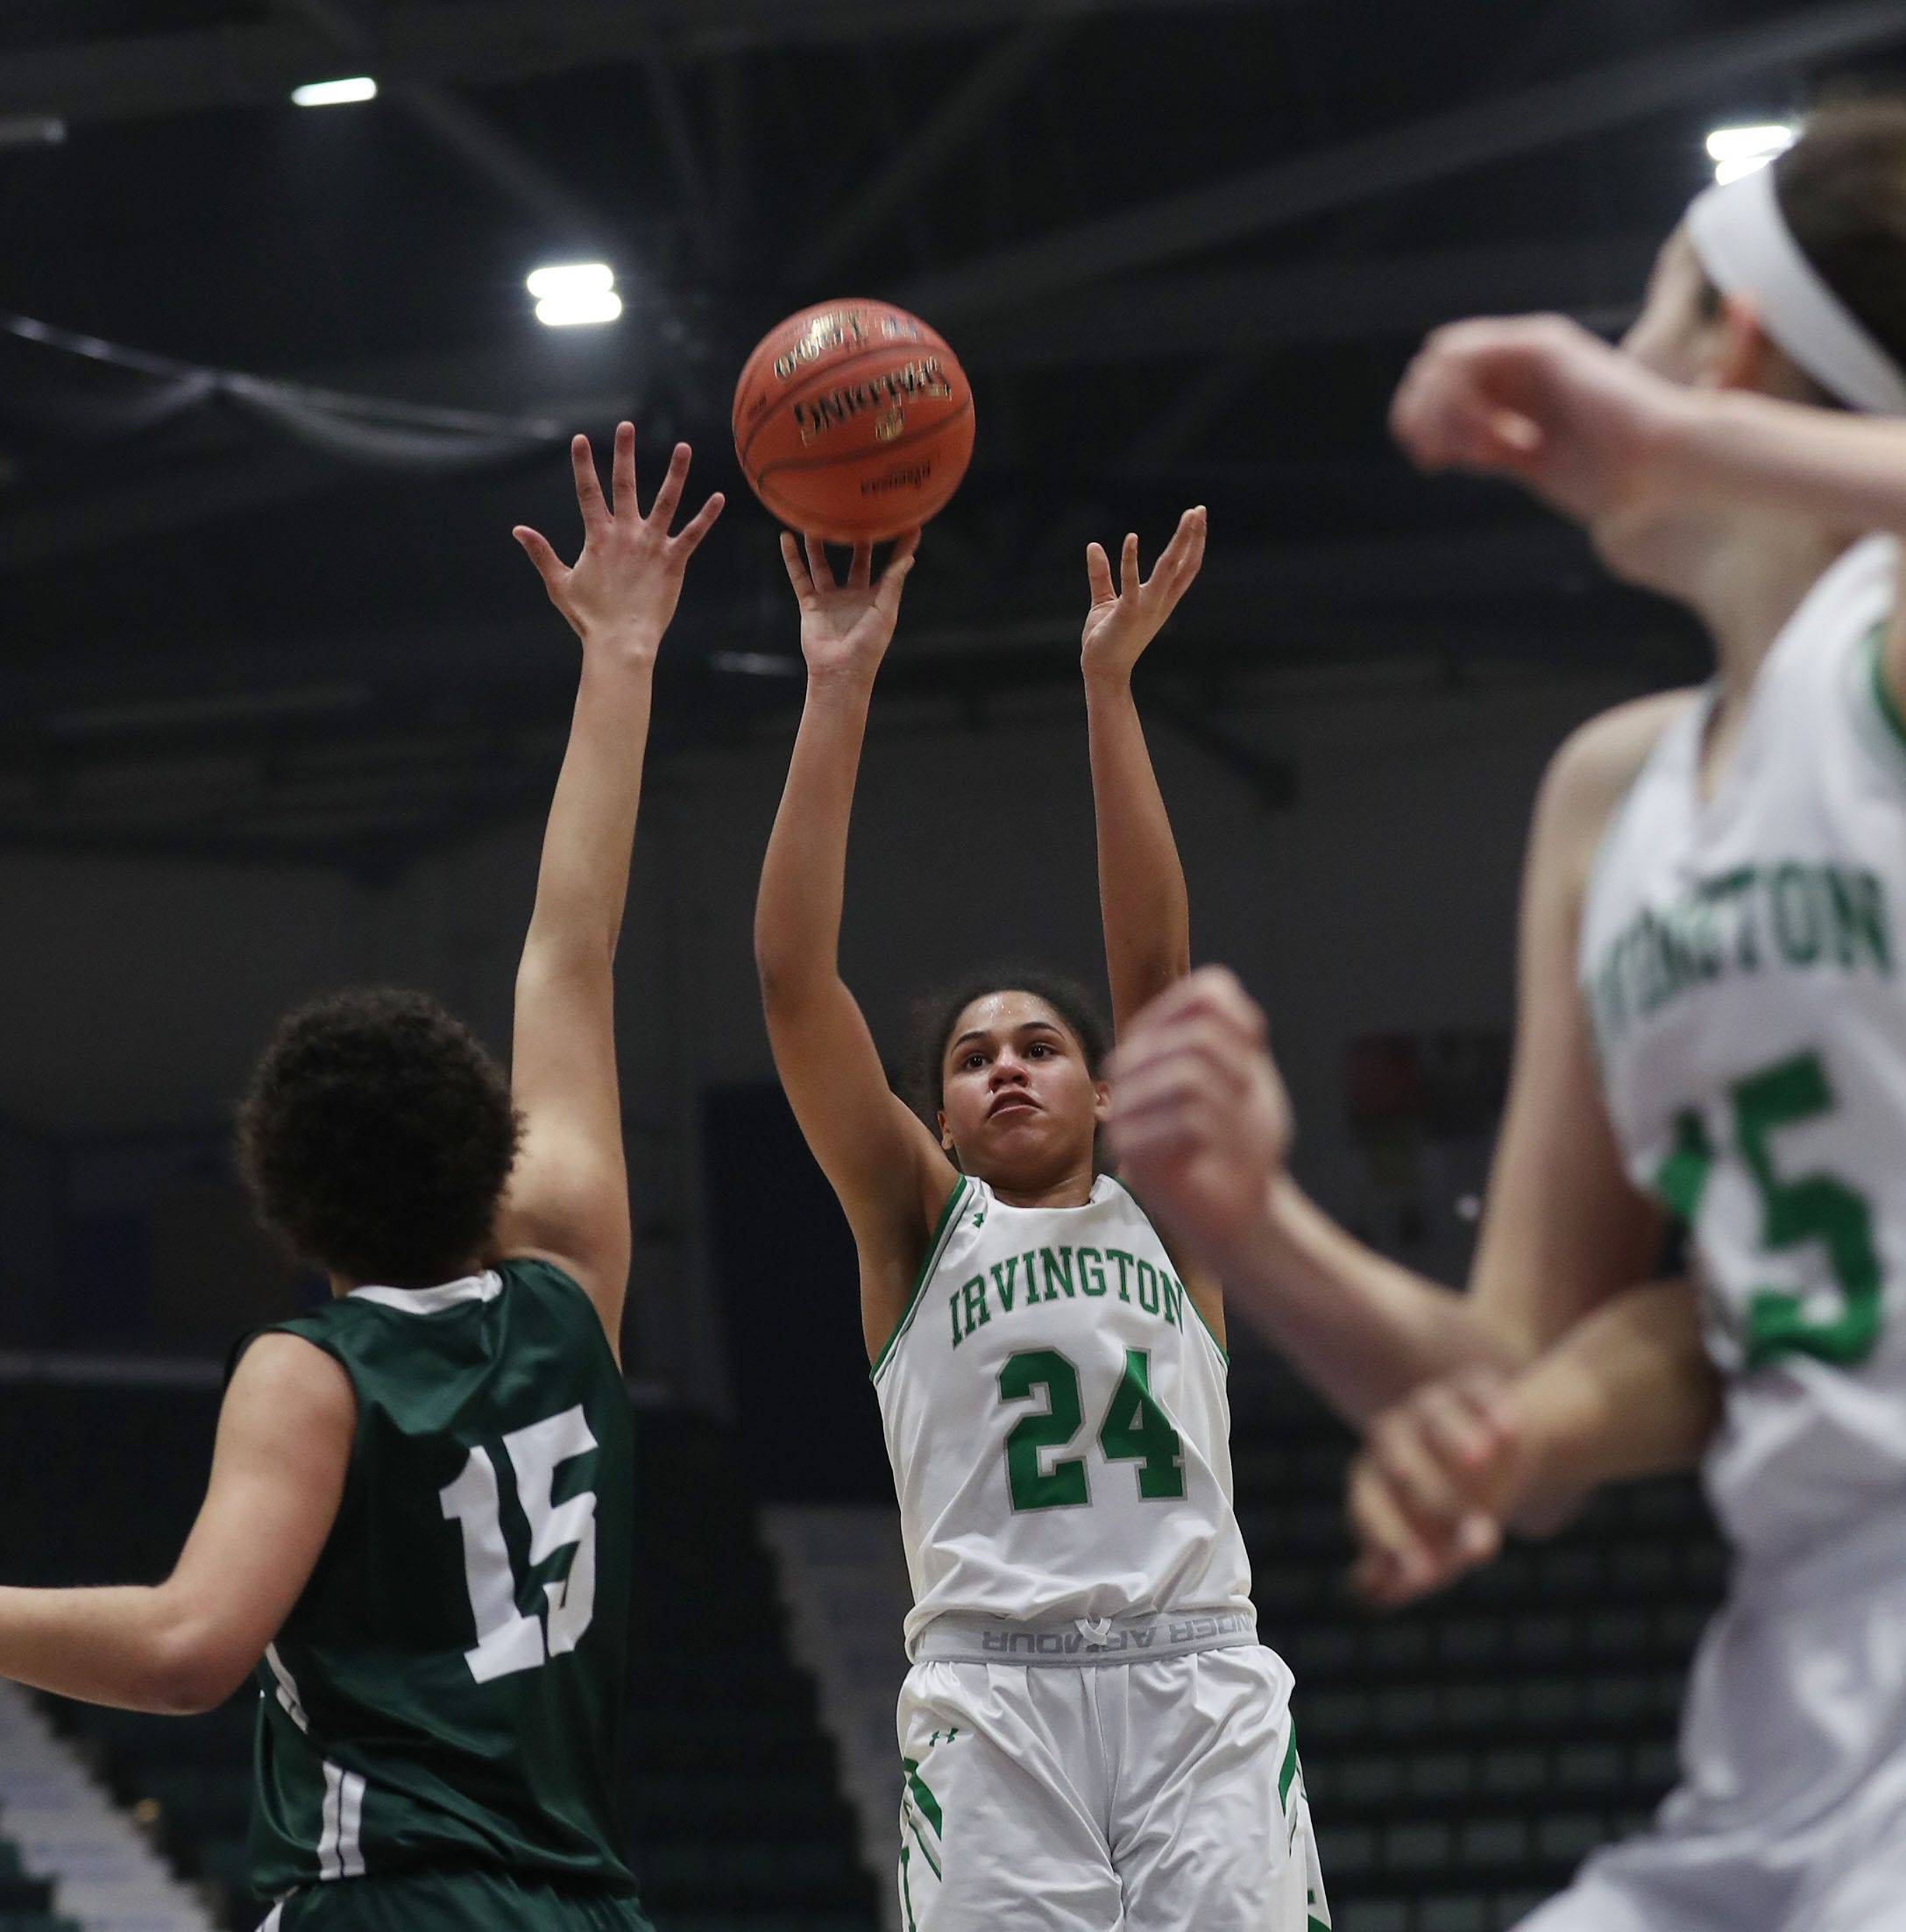 Girls basketball: Irvington wins Federation semifinal behind second-half surge